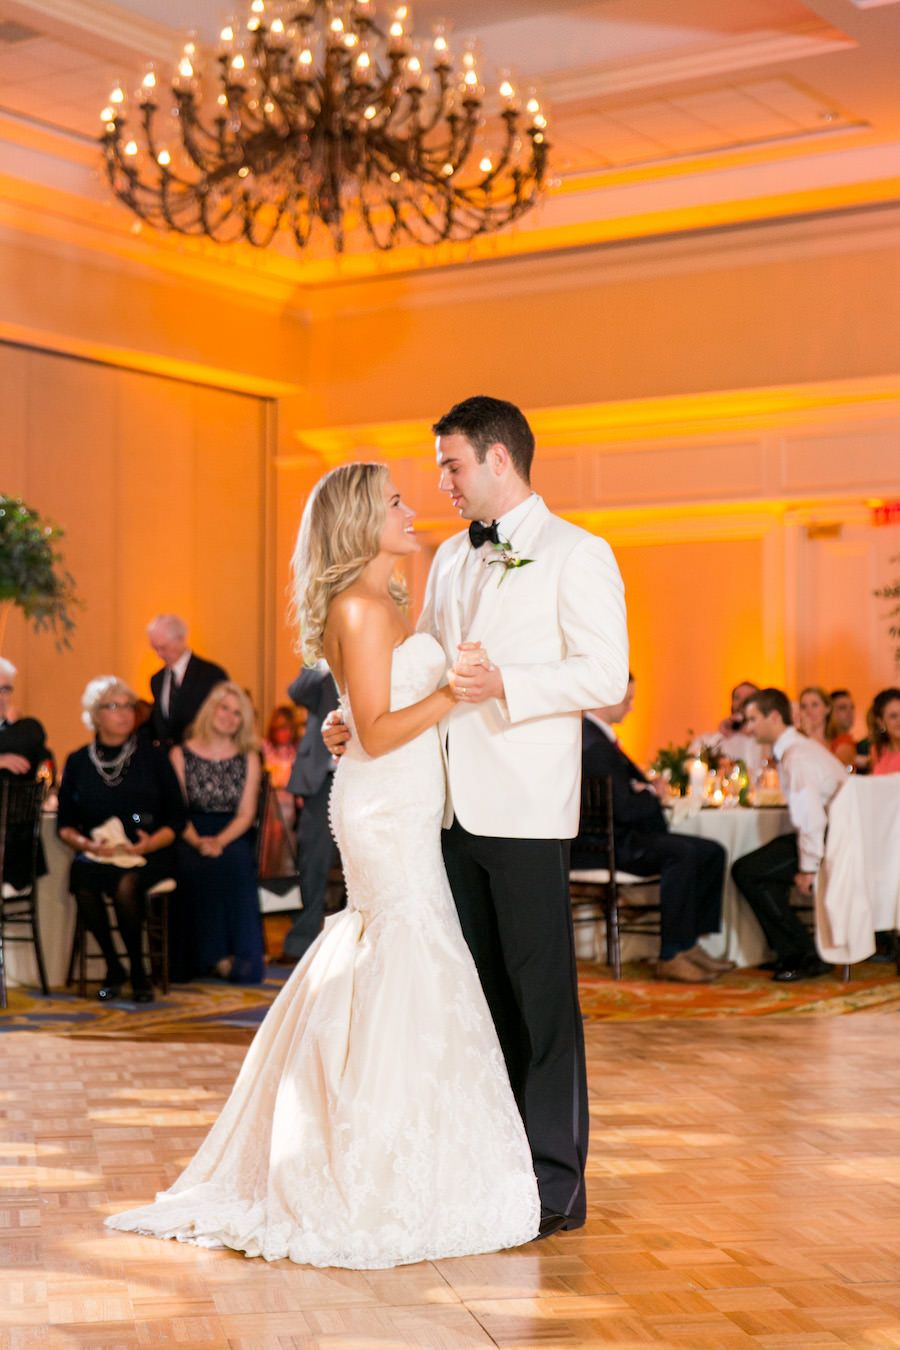 Bride And Groom First Dance At Wedding Reception Tampa Venue Marriott Waterside